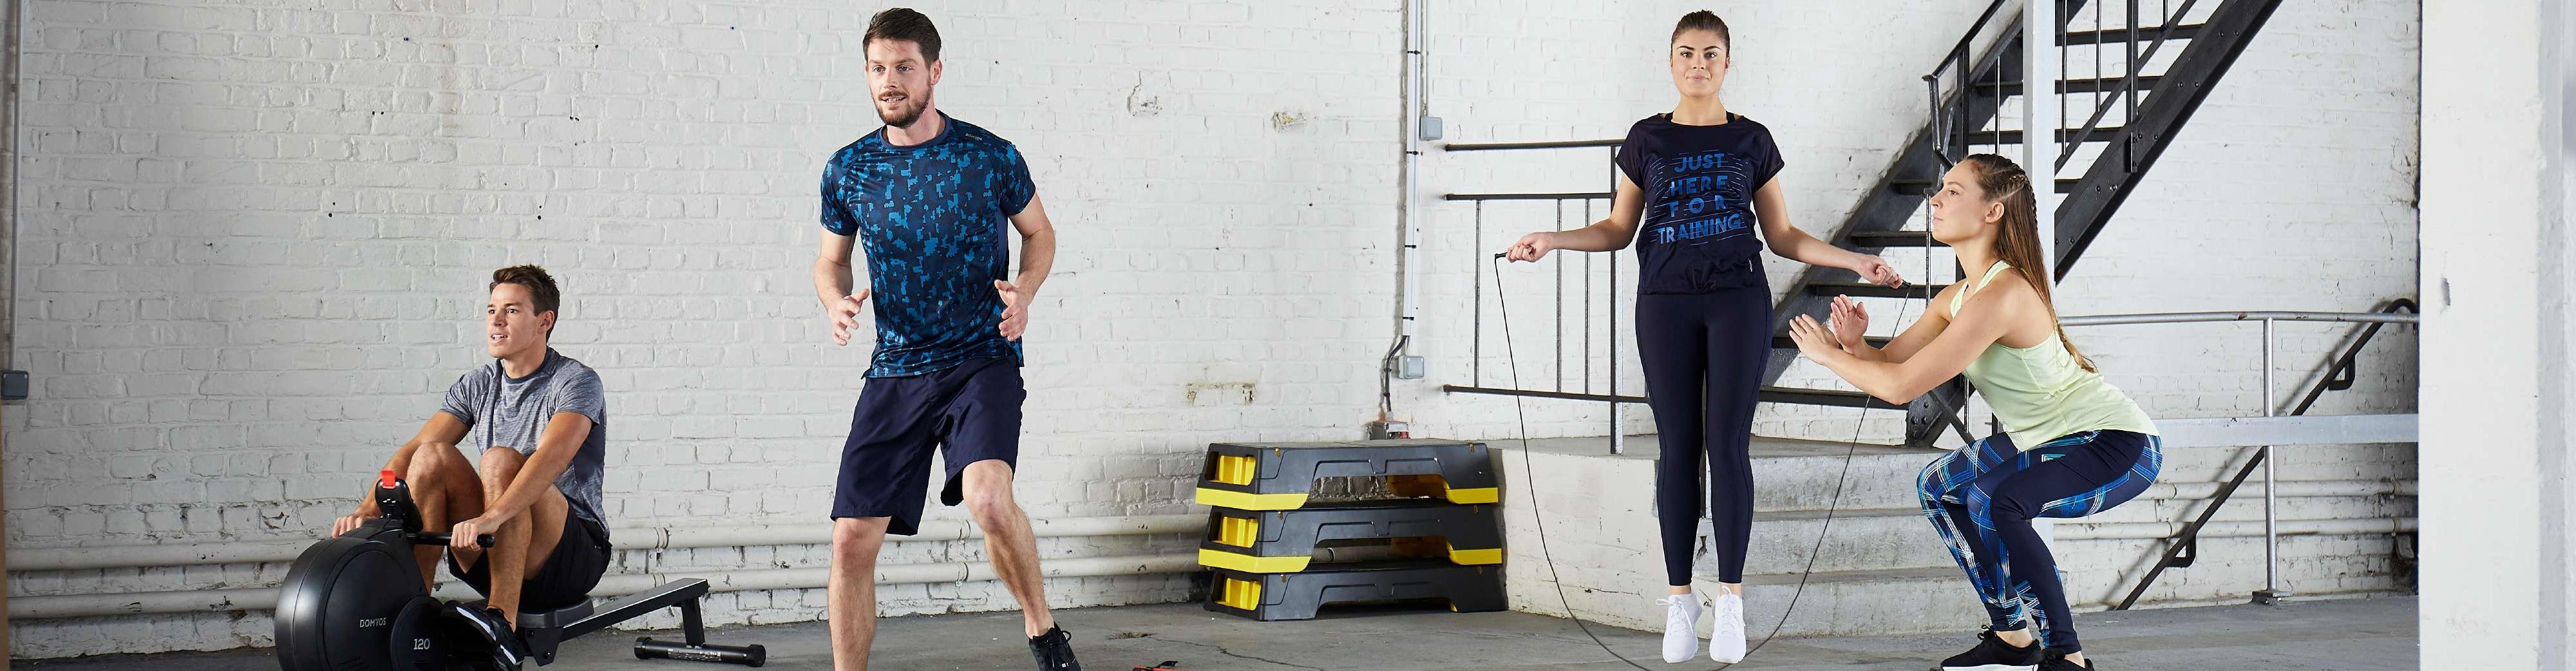 Fitness Cardio Clothes